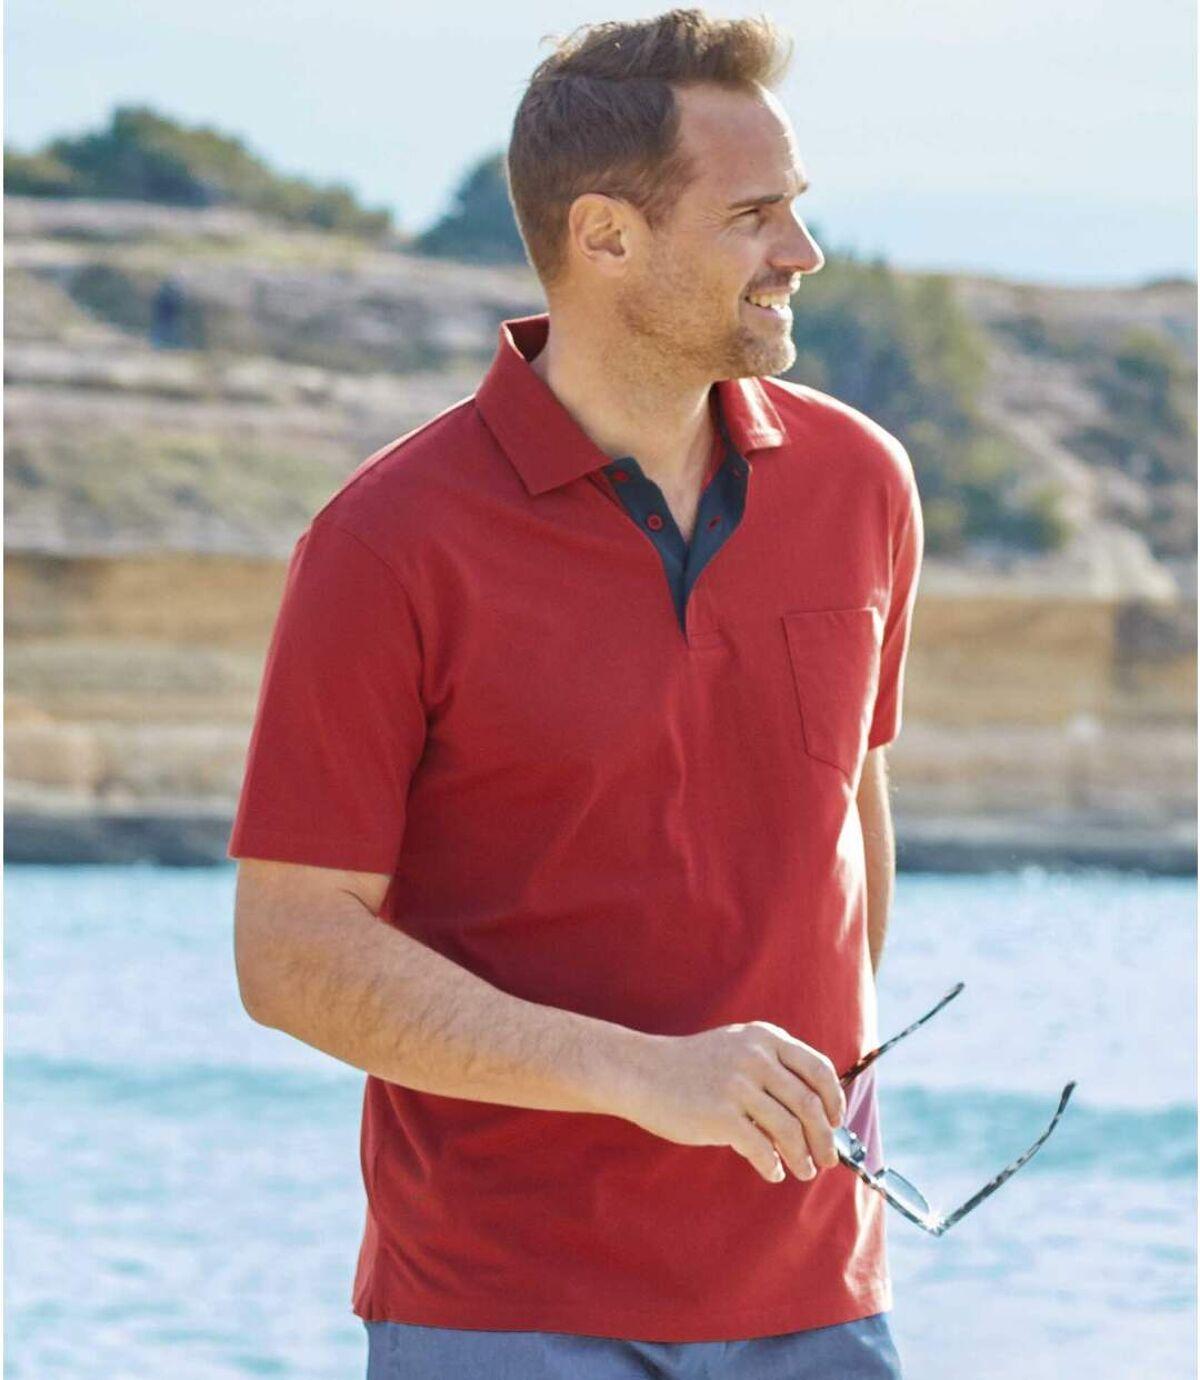 3darabos mediterrán jersey teniszing szett Atlas For Men